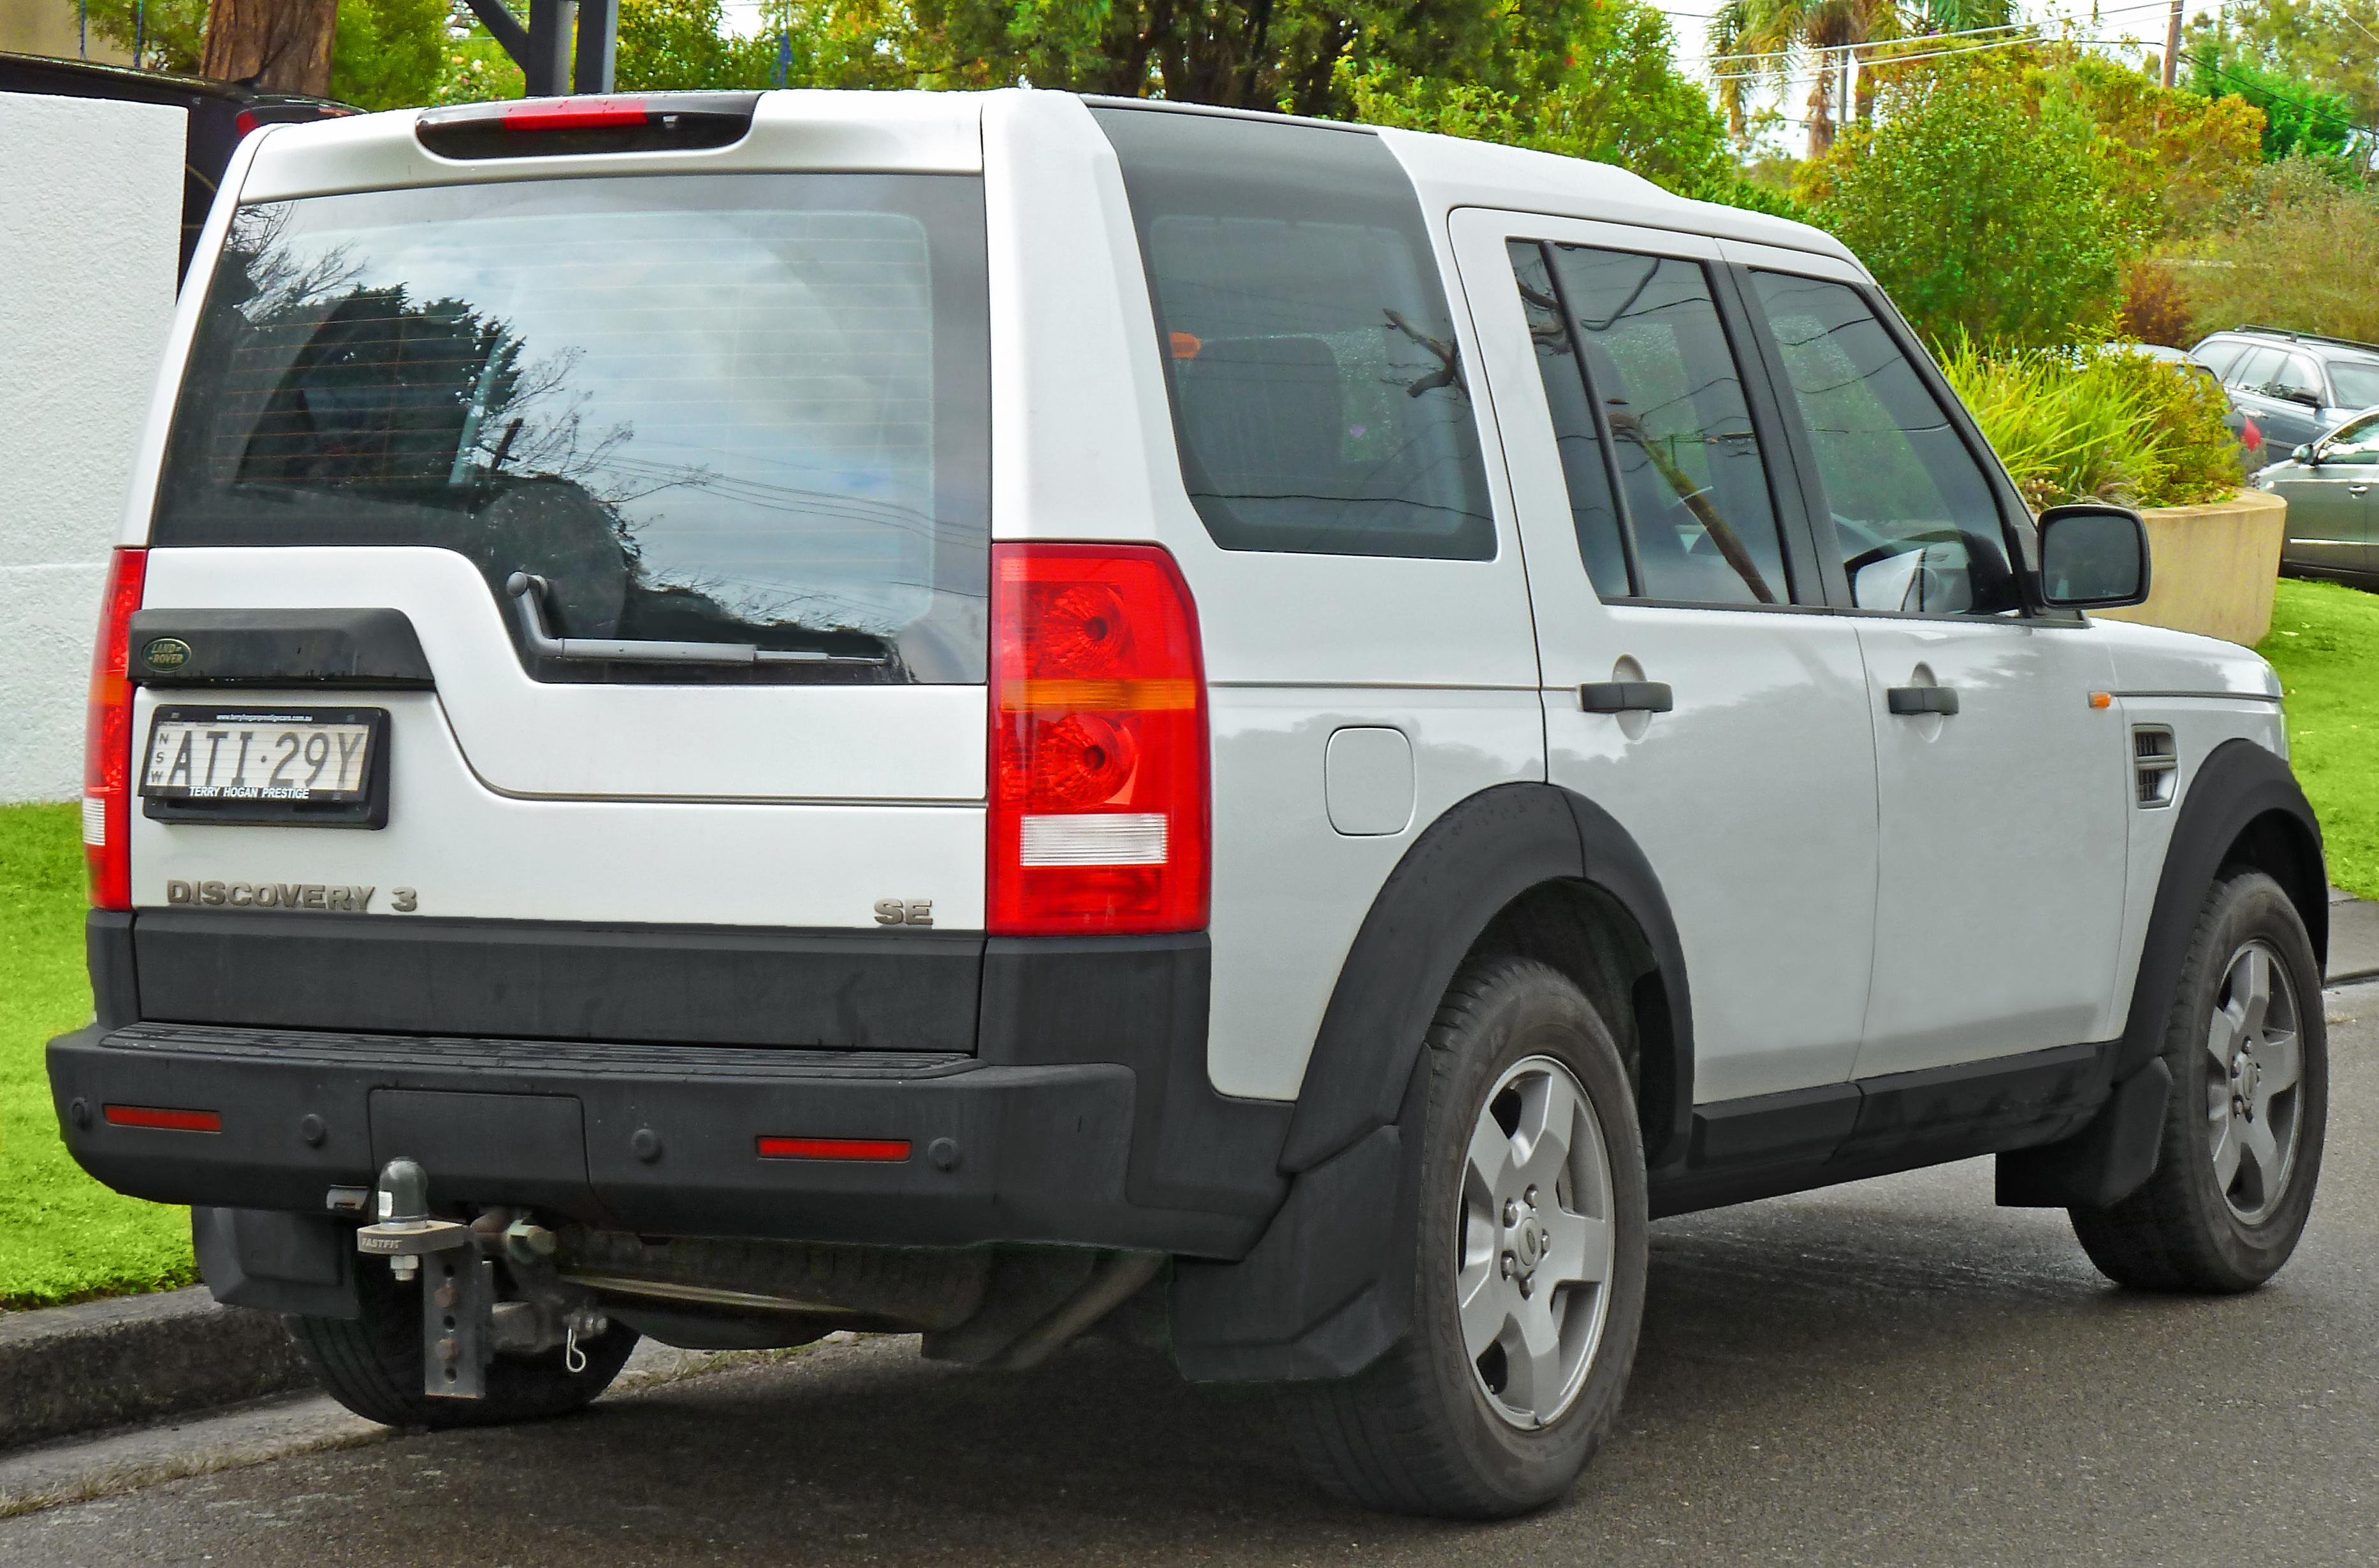 https://upload.wikimedia.org/wikipedia/commons/e/e5/2005-2007_Land_Rover_Discovery_3_SE_wagon_%282011-07-17%29.jpg